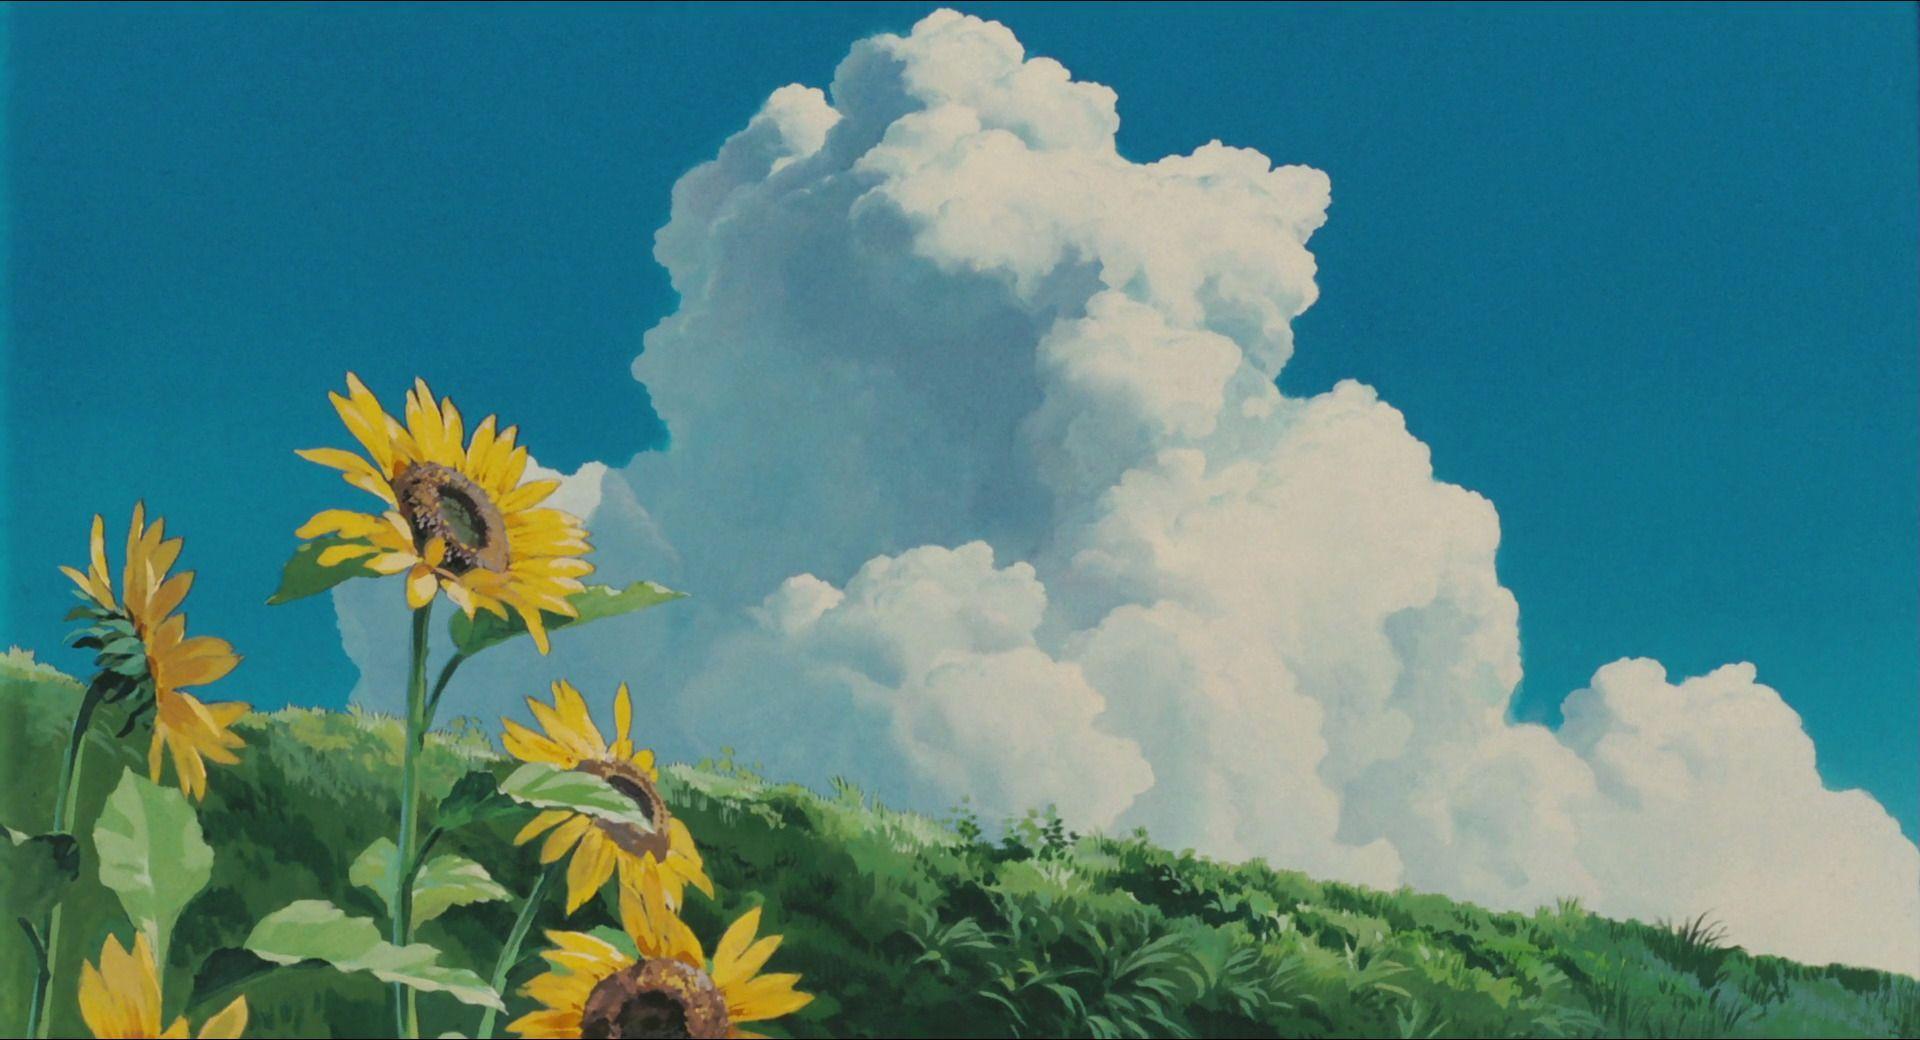 Studio Ghibli Skies Google Search Studio ghibli